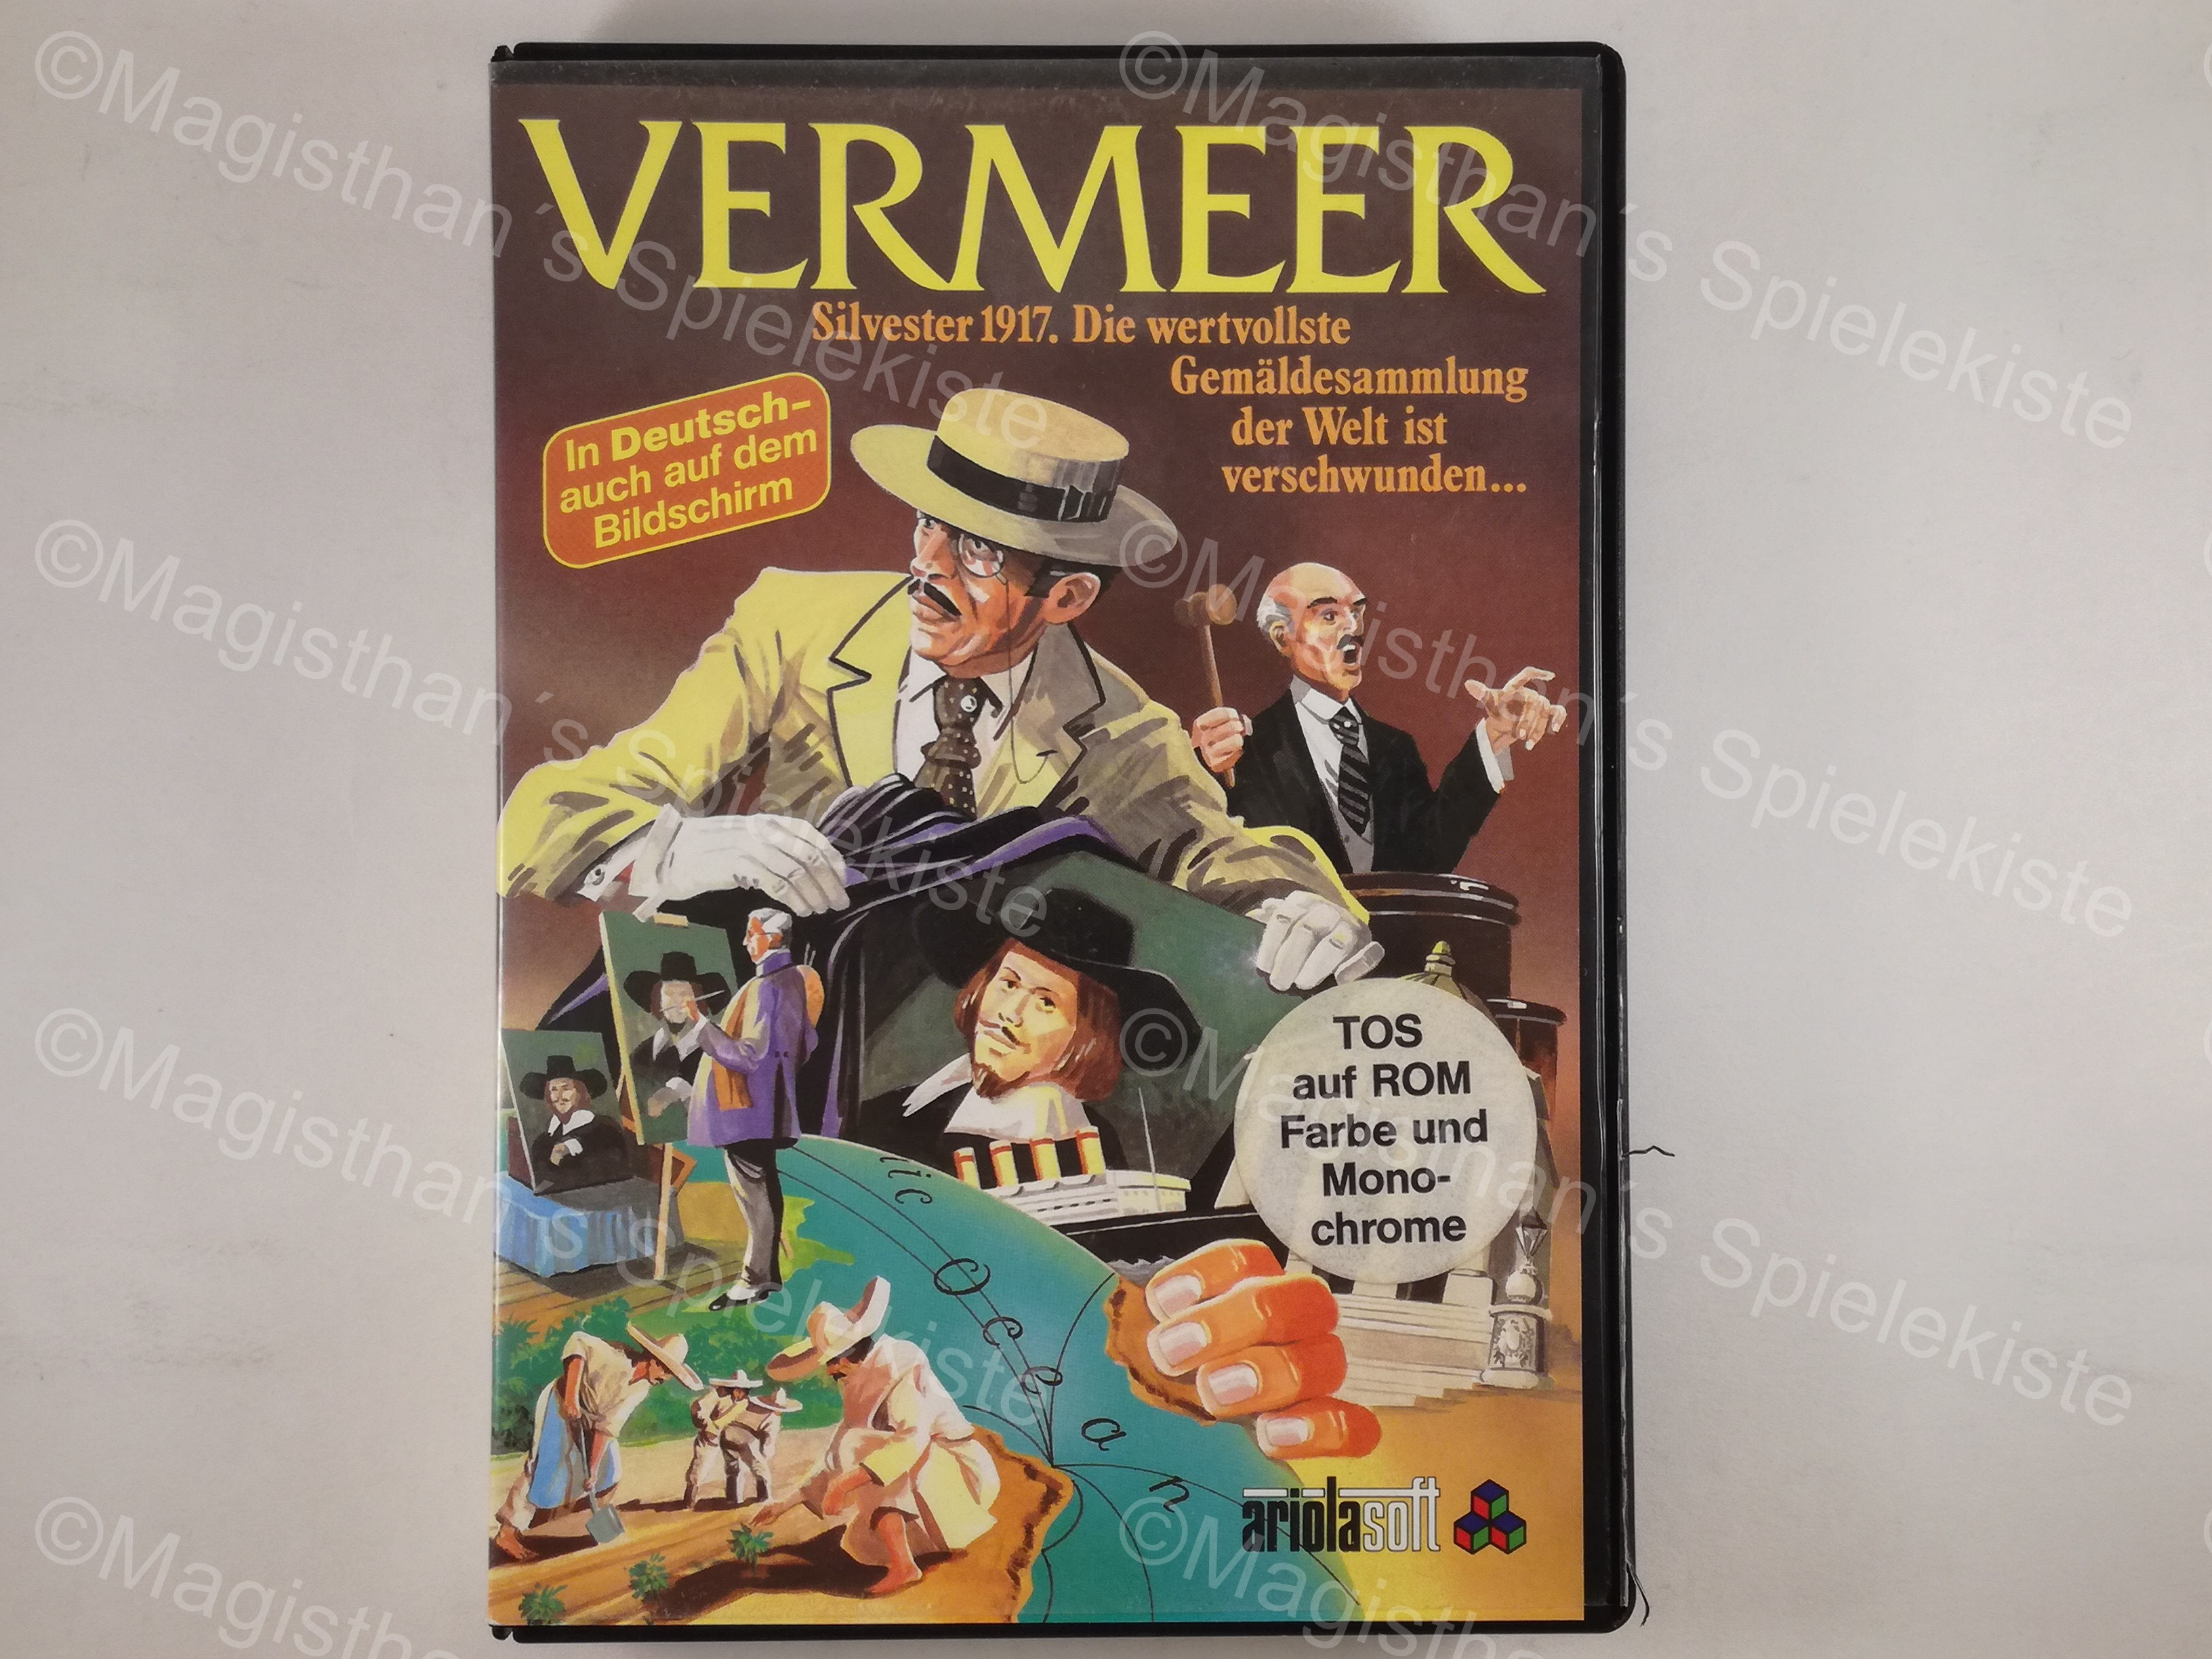 VermeerAtari1.jpg